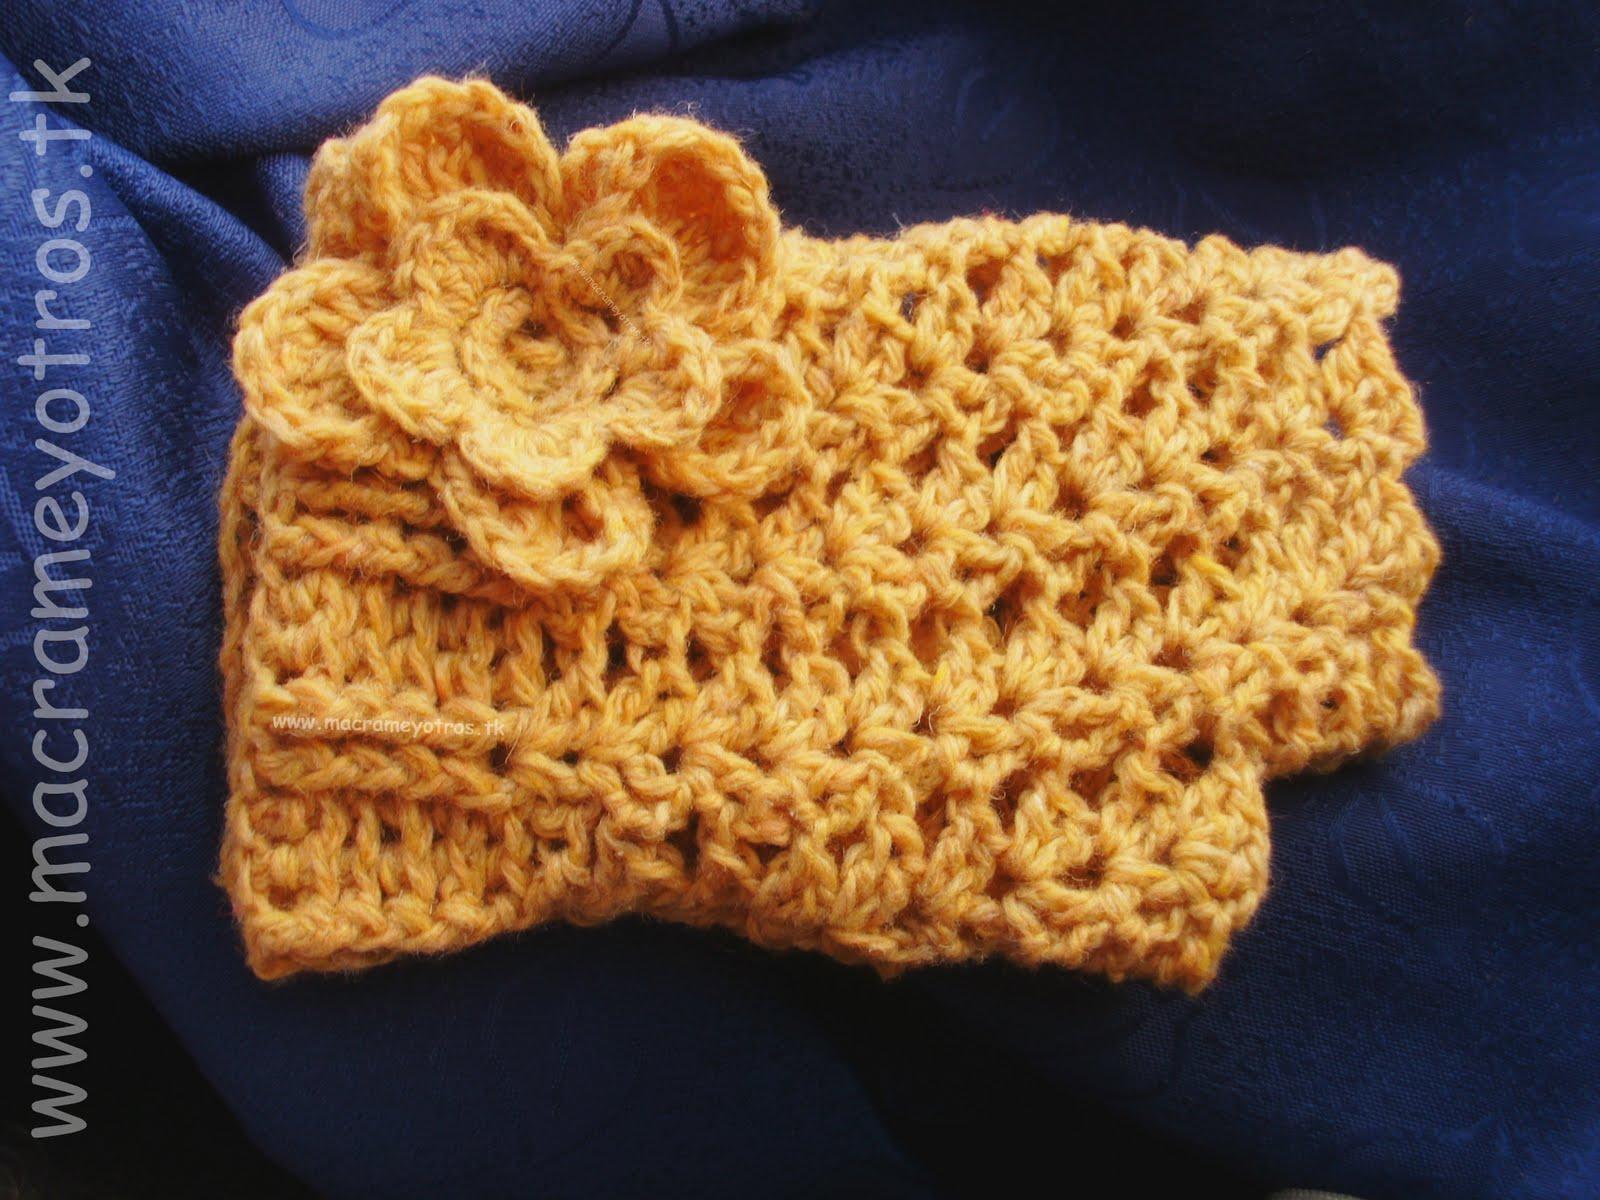 Famoso Guante Sin Dedos Patrón De Crochet Composición - Ideas de ...